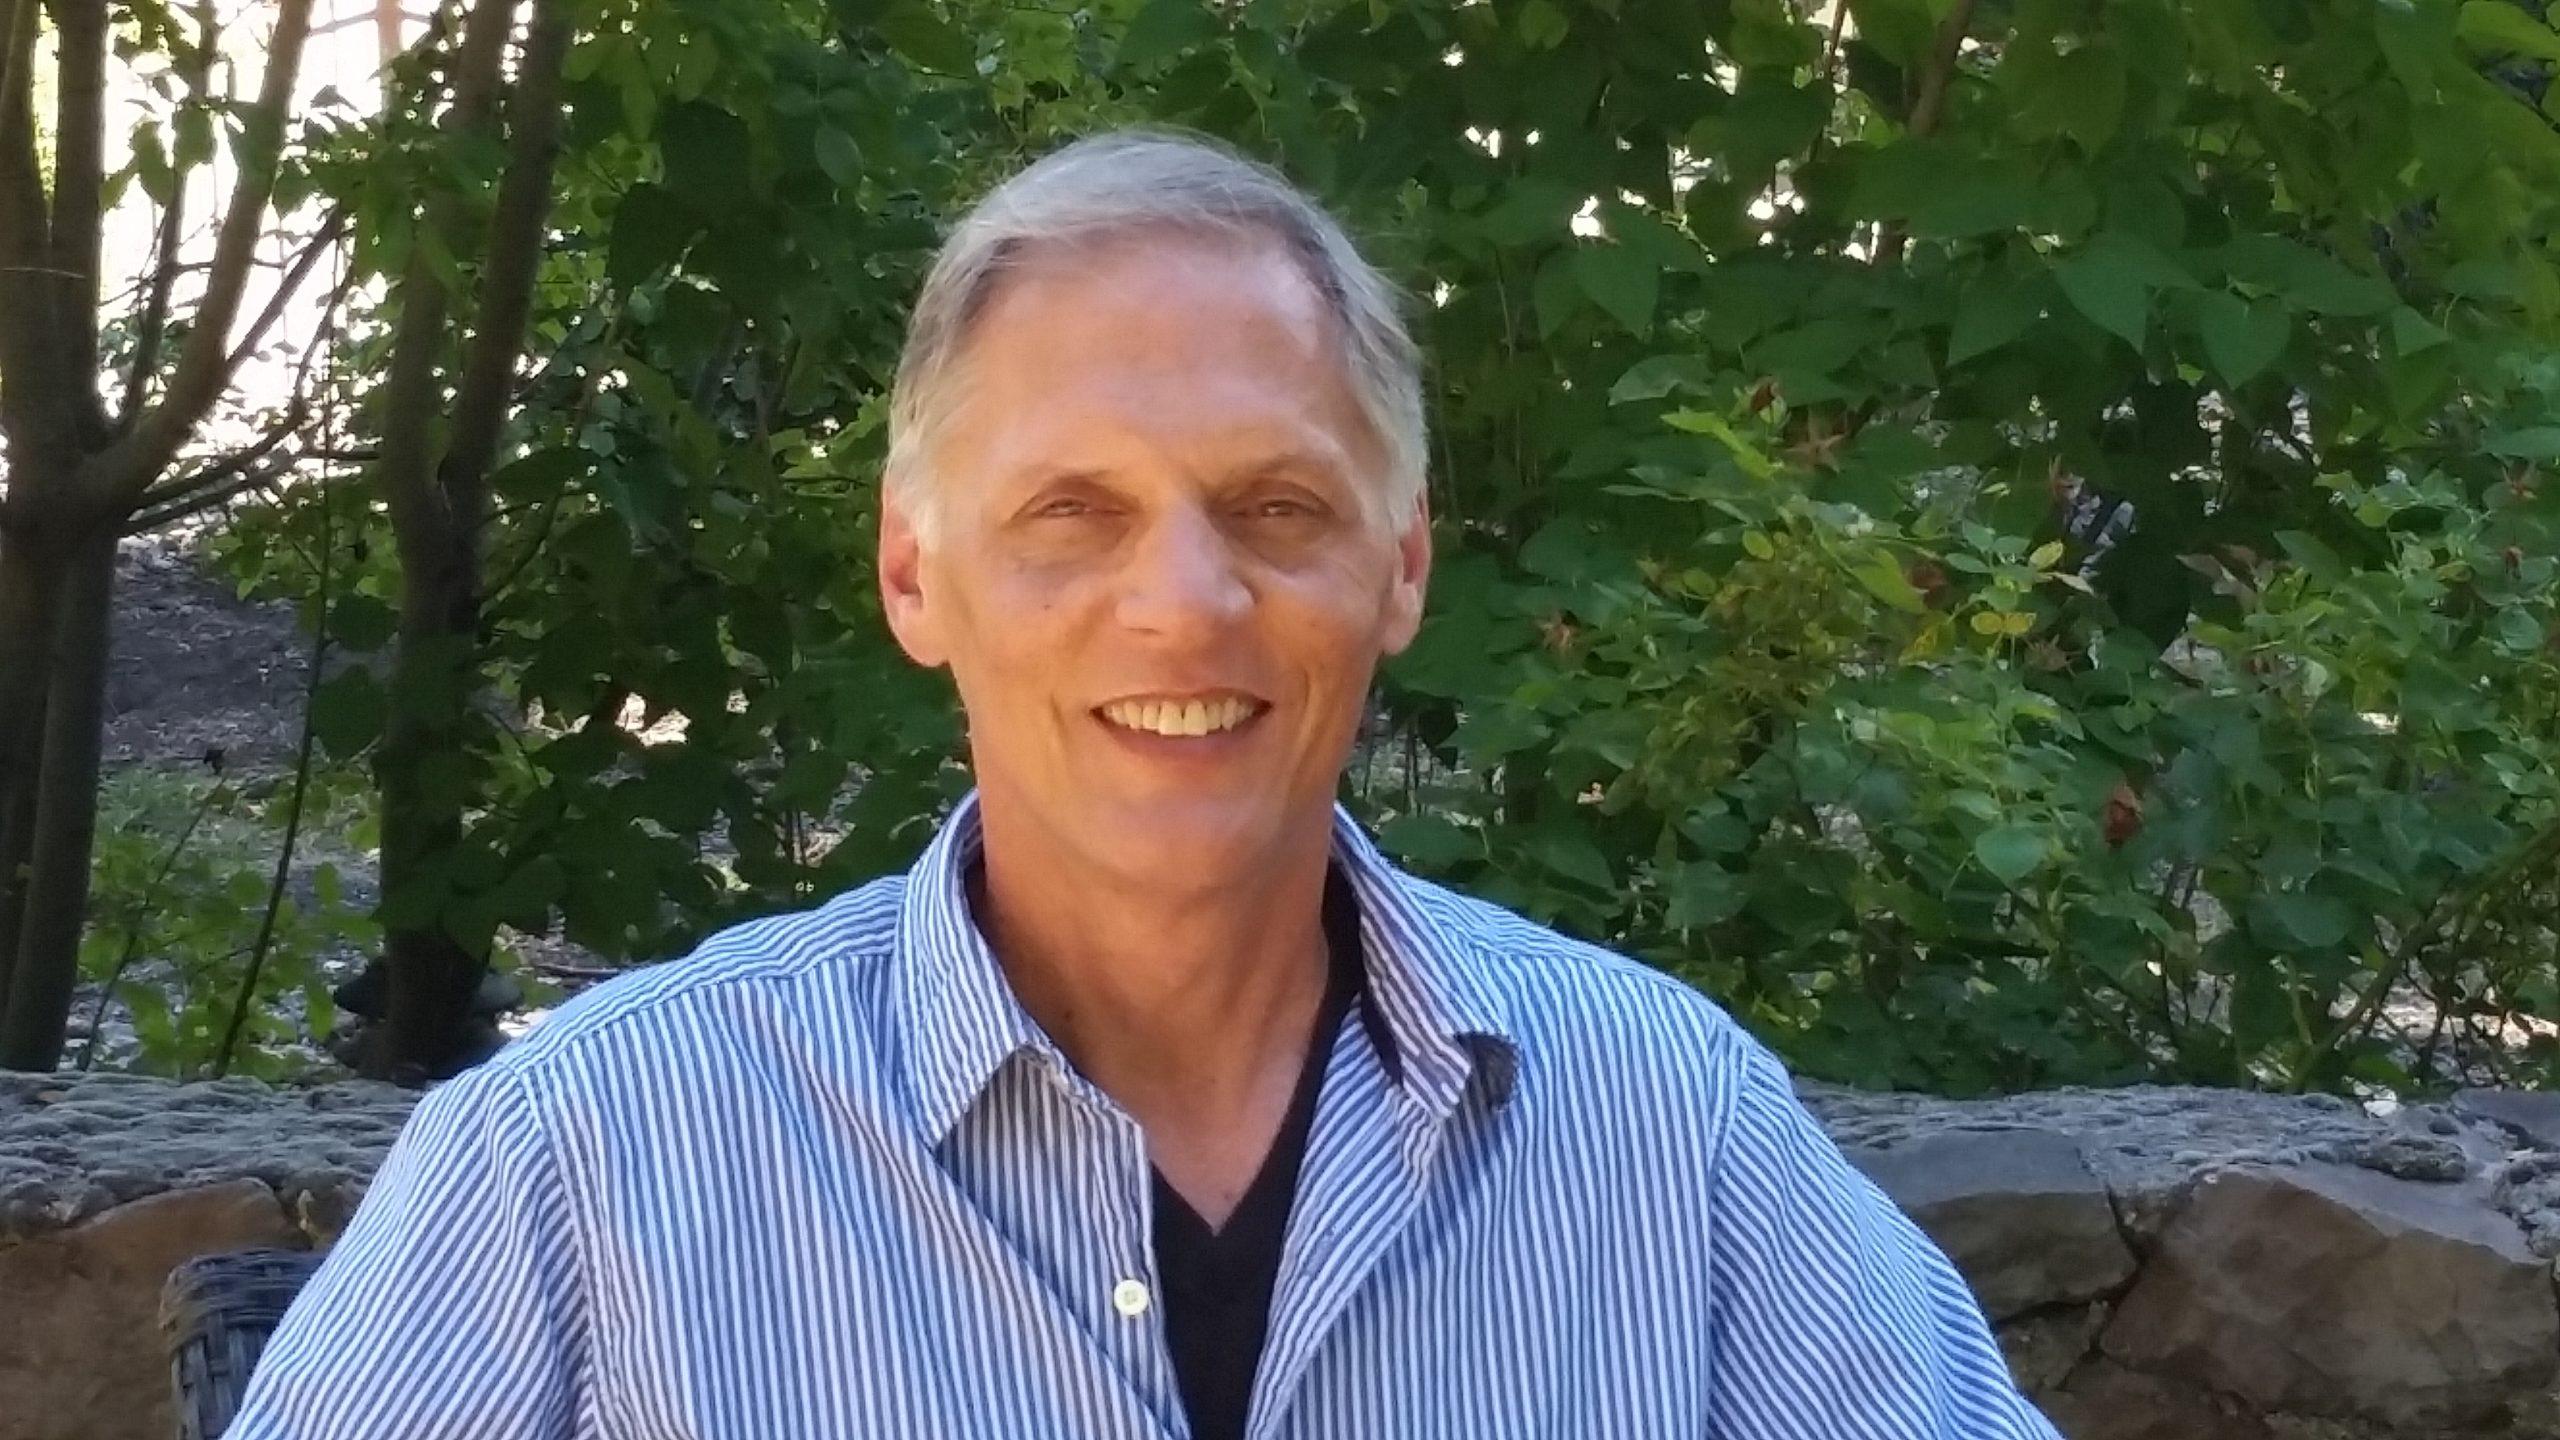 David Ingebritsen, PhD, LCPC